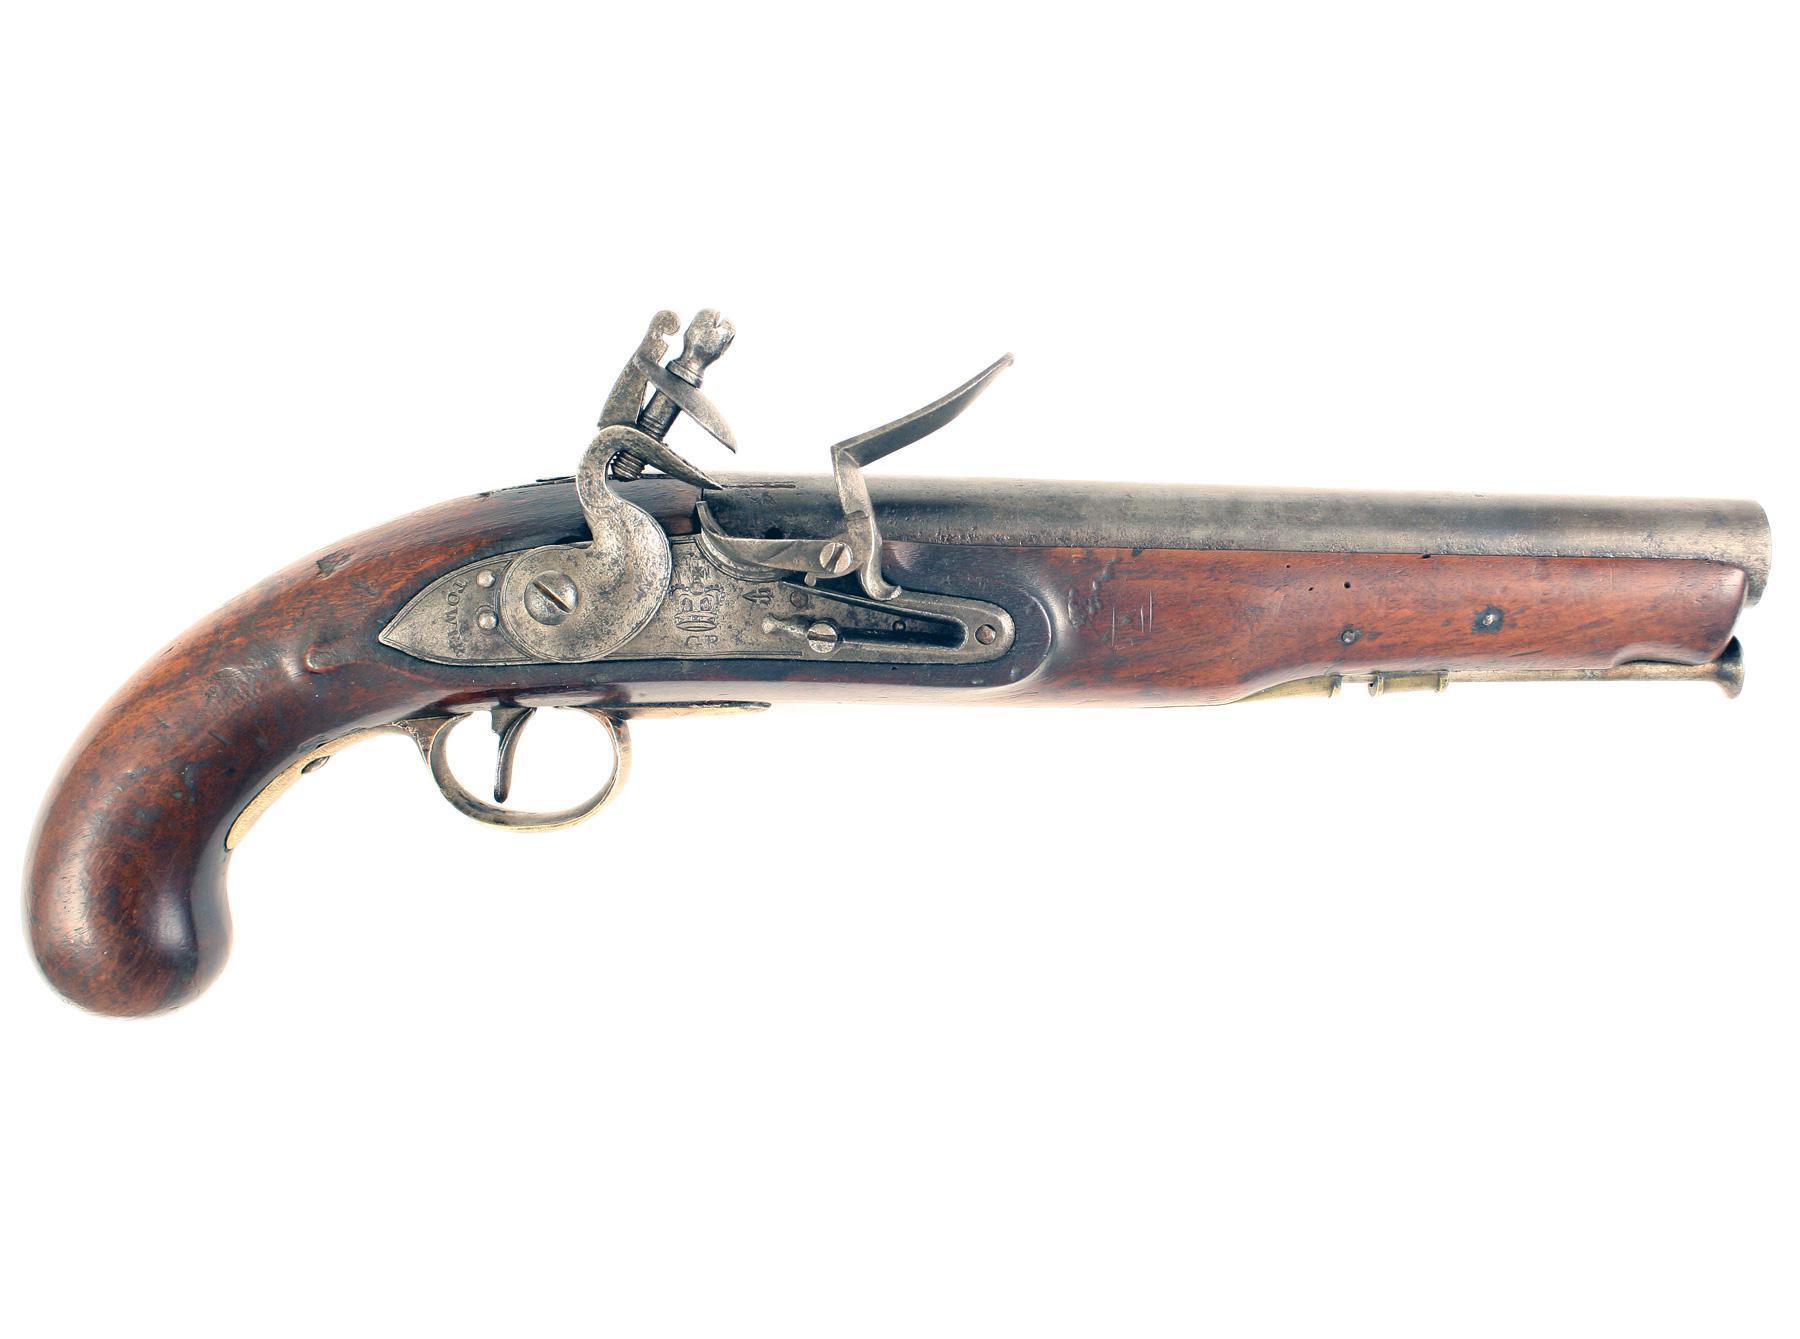 A Regimentally Marked Heavy Dragoon Pistol